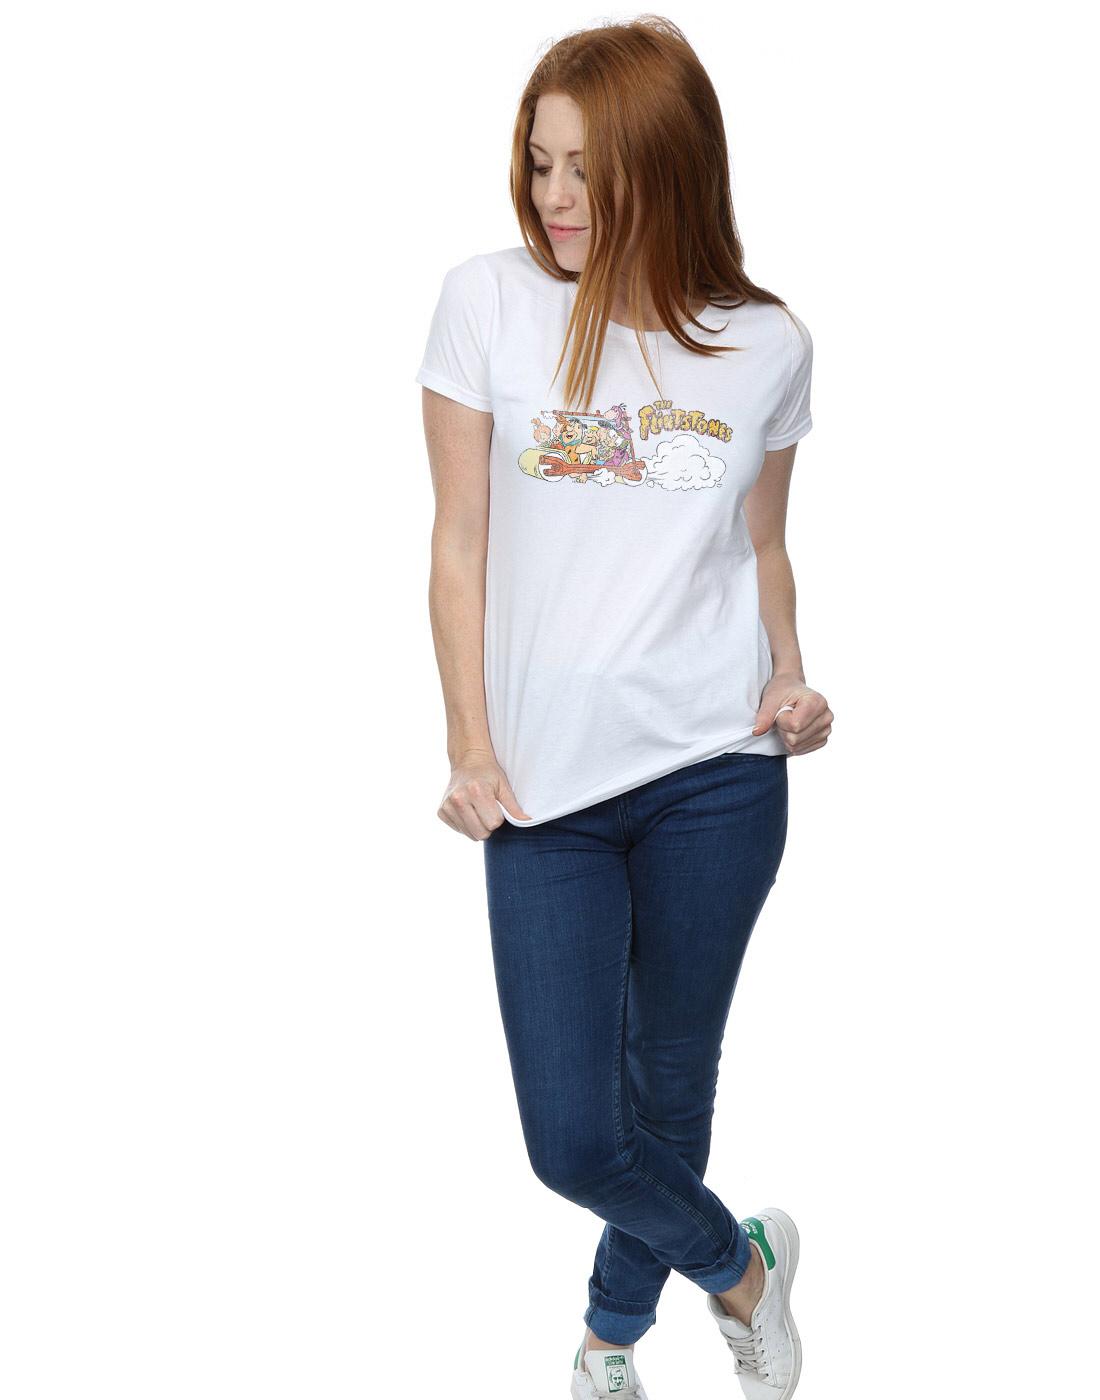 The-Flintstones-Women-039-s-Family-Car-Distressed-T-Shirt thumbnail 20